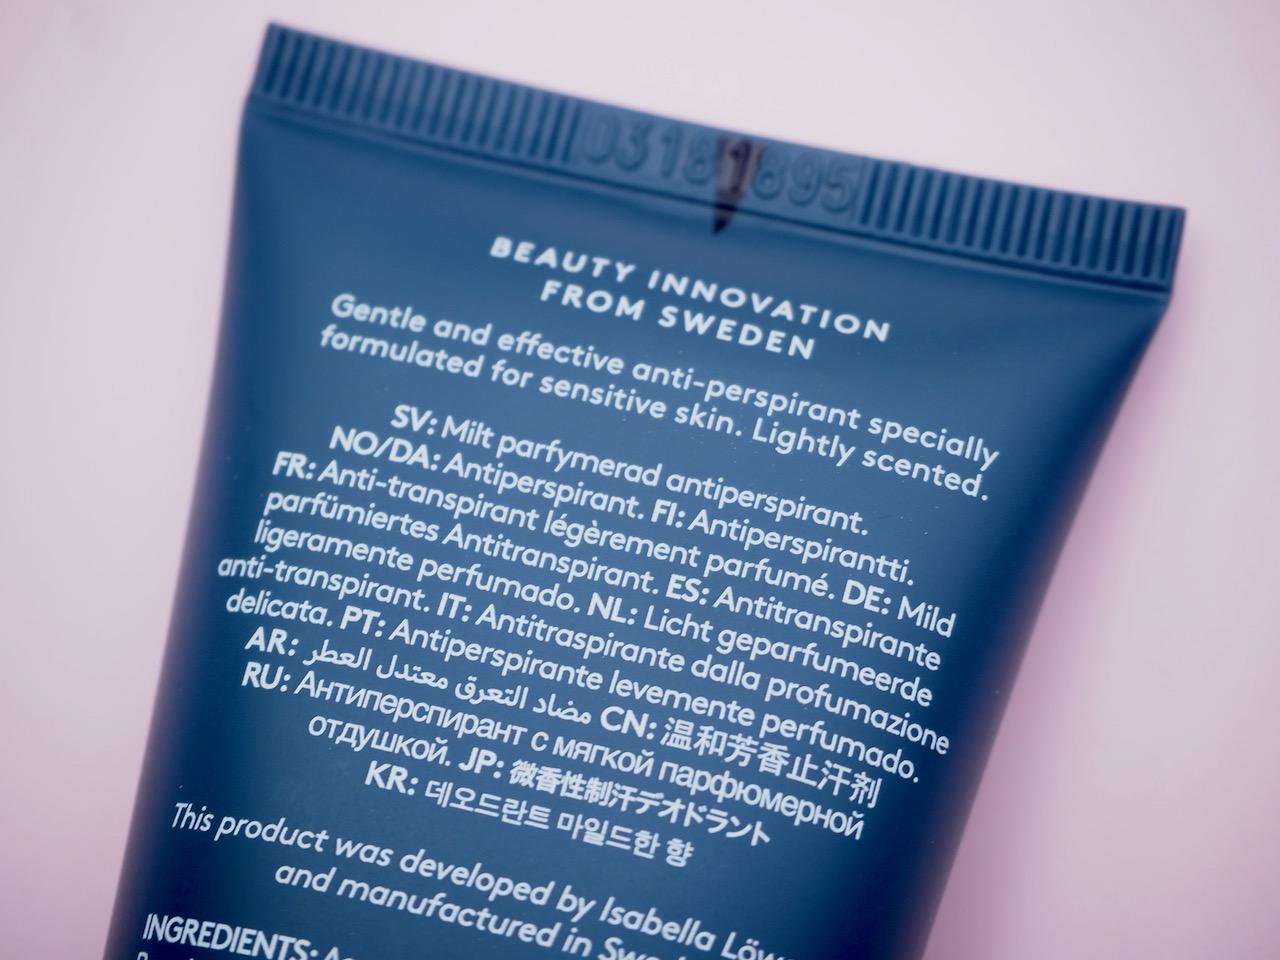 Löwengrip Sensitive Deodorant antiperspirantti kokemuksia Virve Fredman